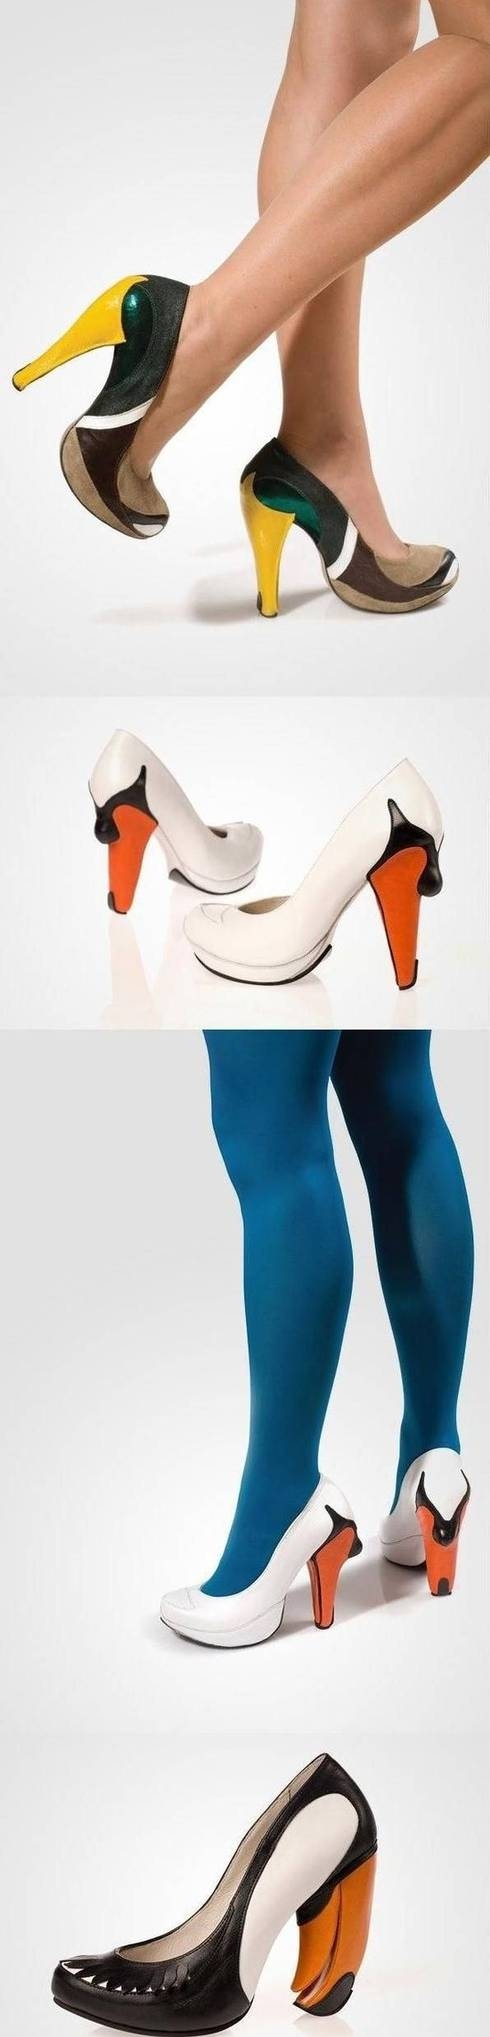 sepatu high heels yang unik (2)